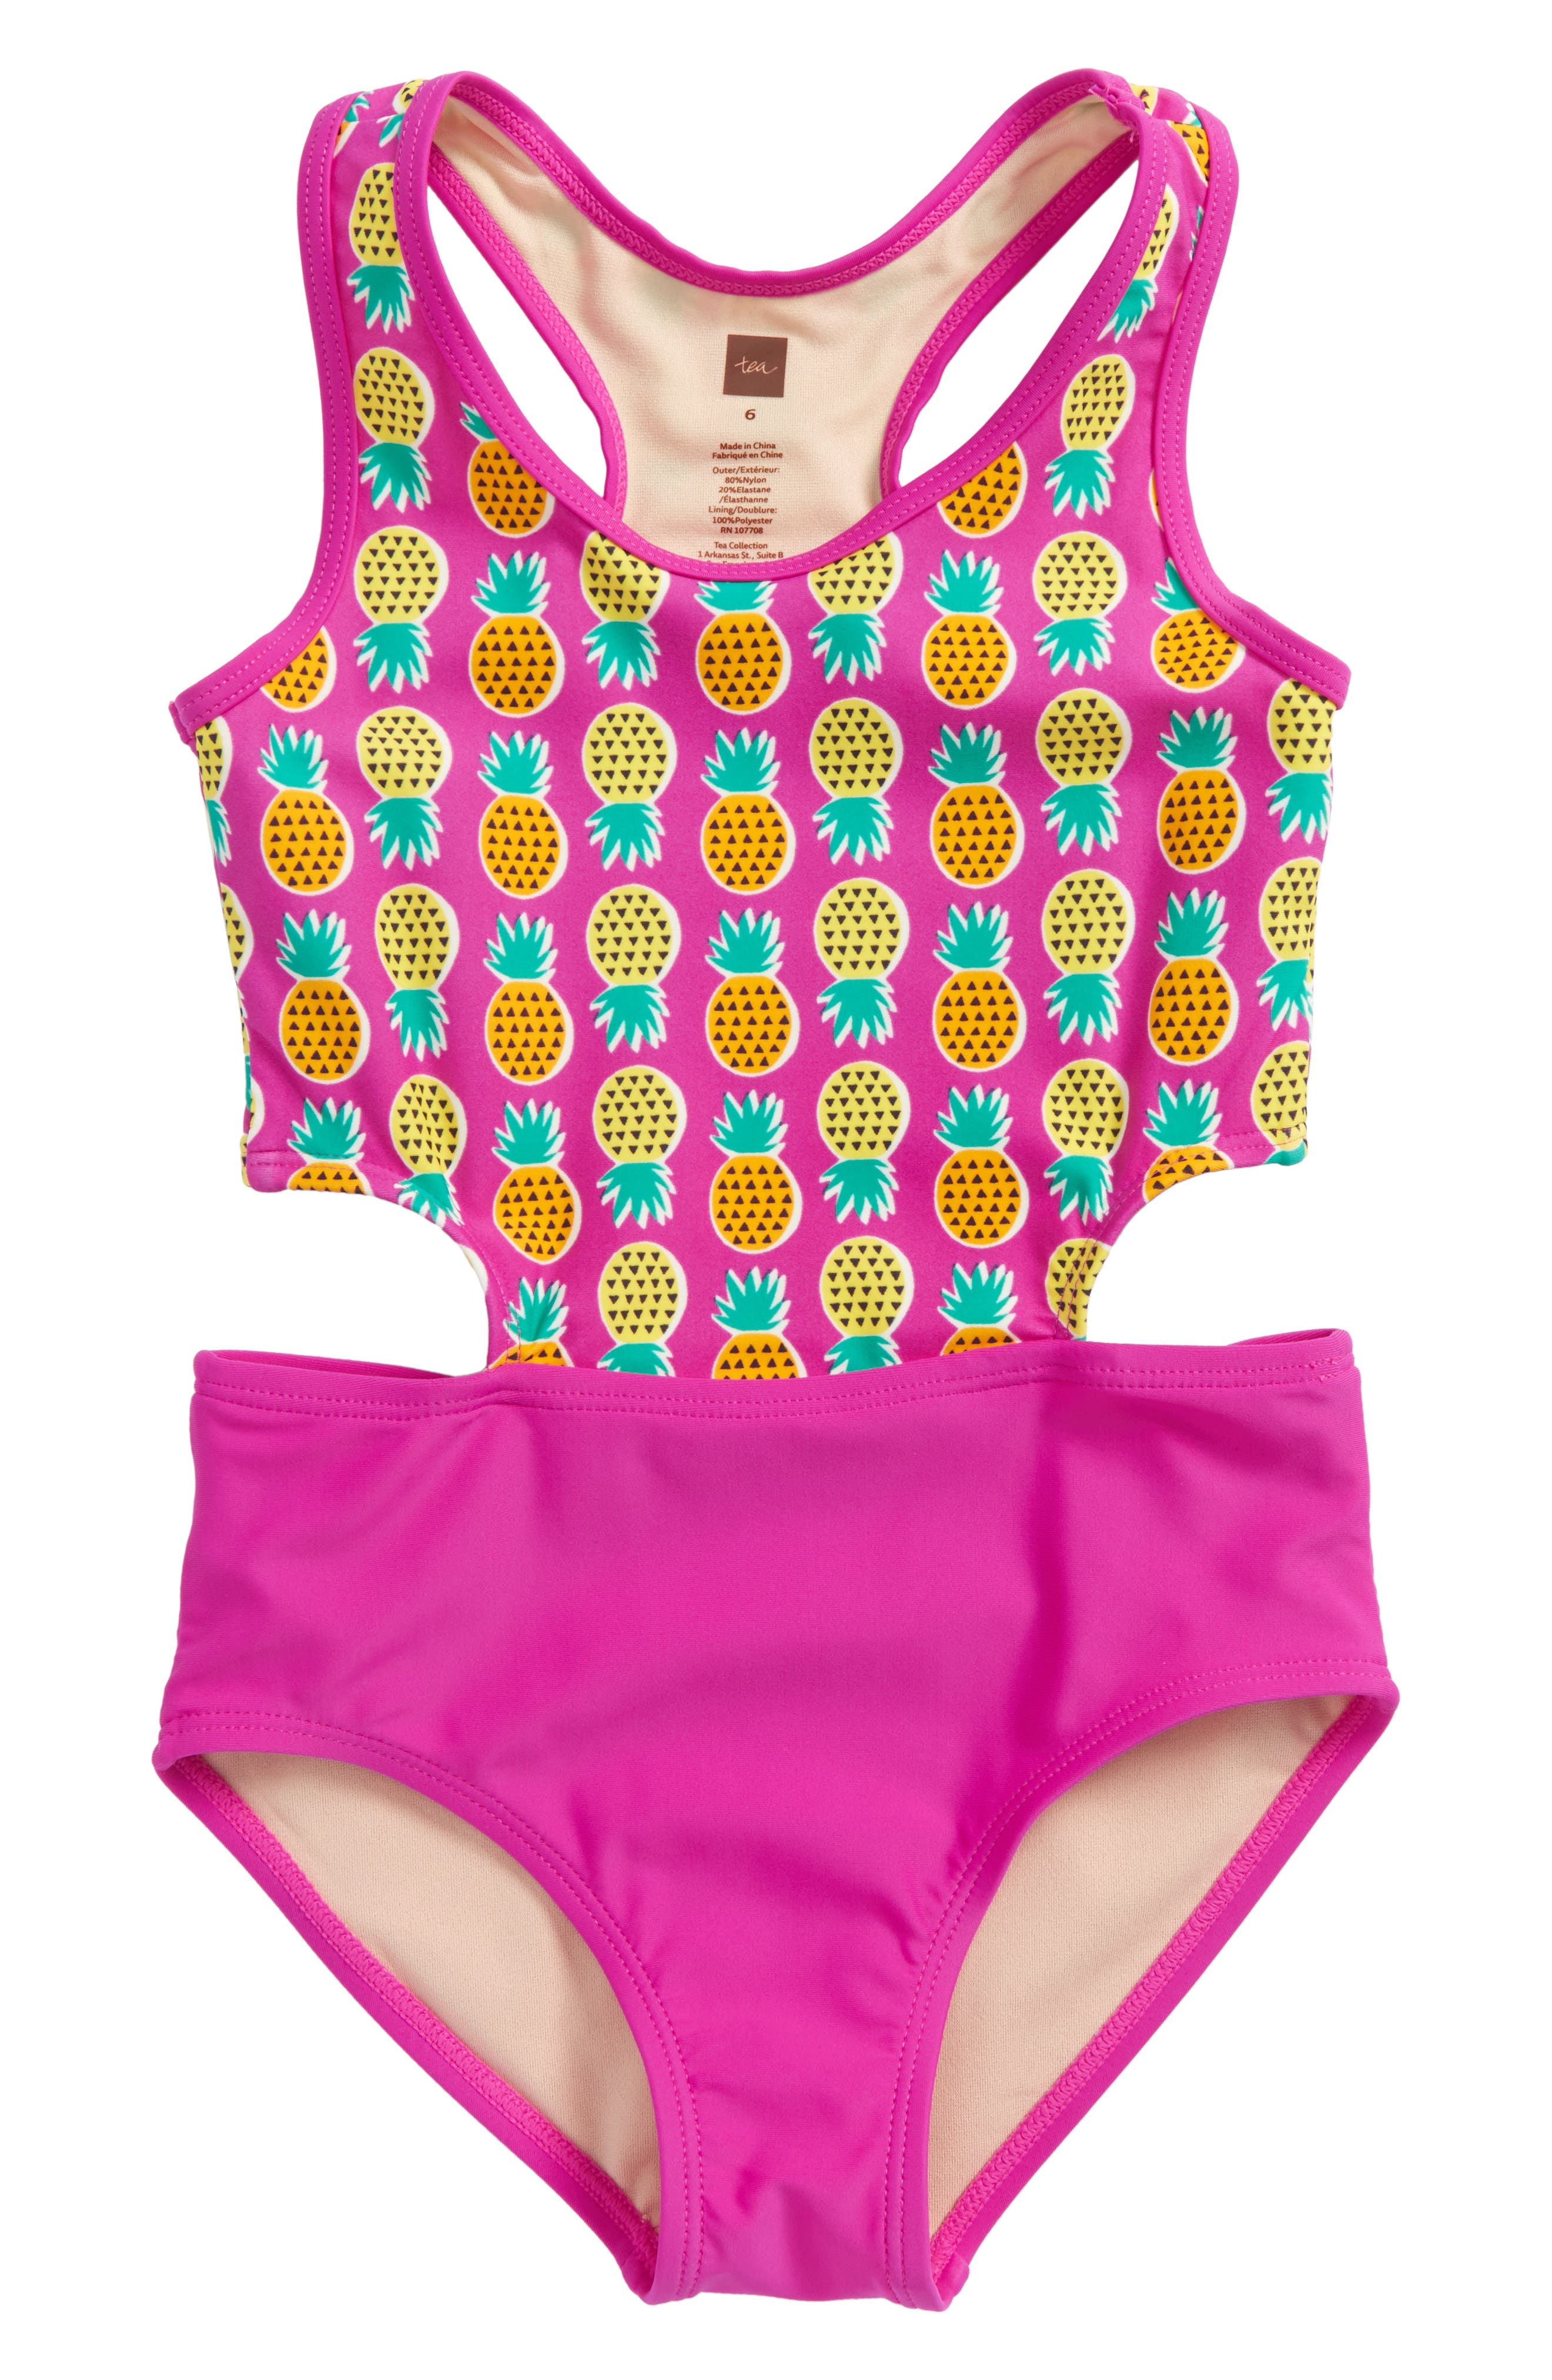 TEA COLLECTION,                             Cutout One-Piece Swimsuit,                             Main thumbnail 1, color,                             671